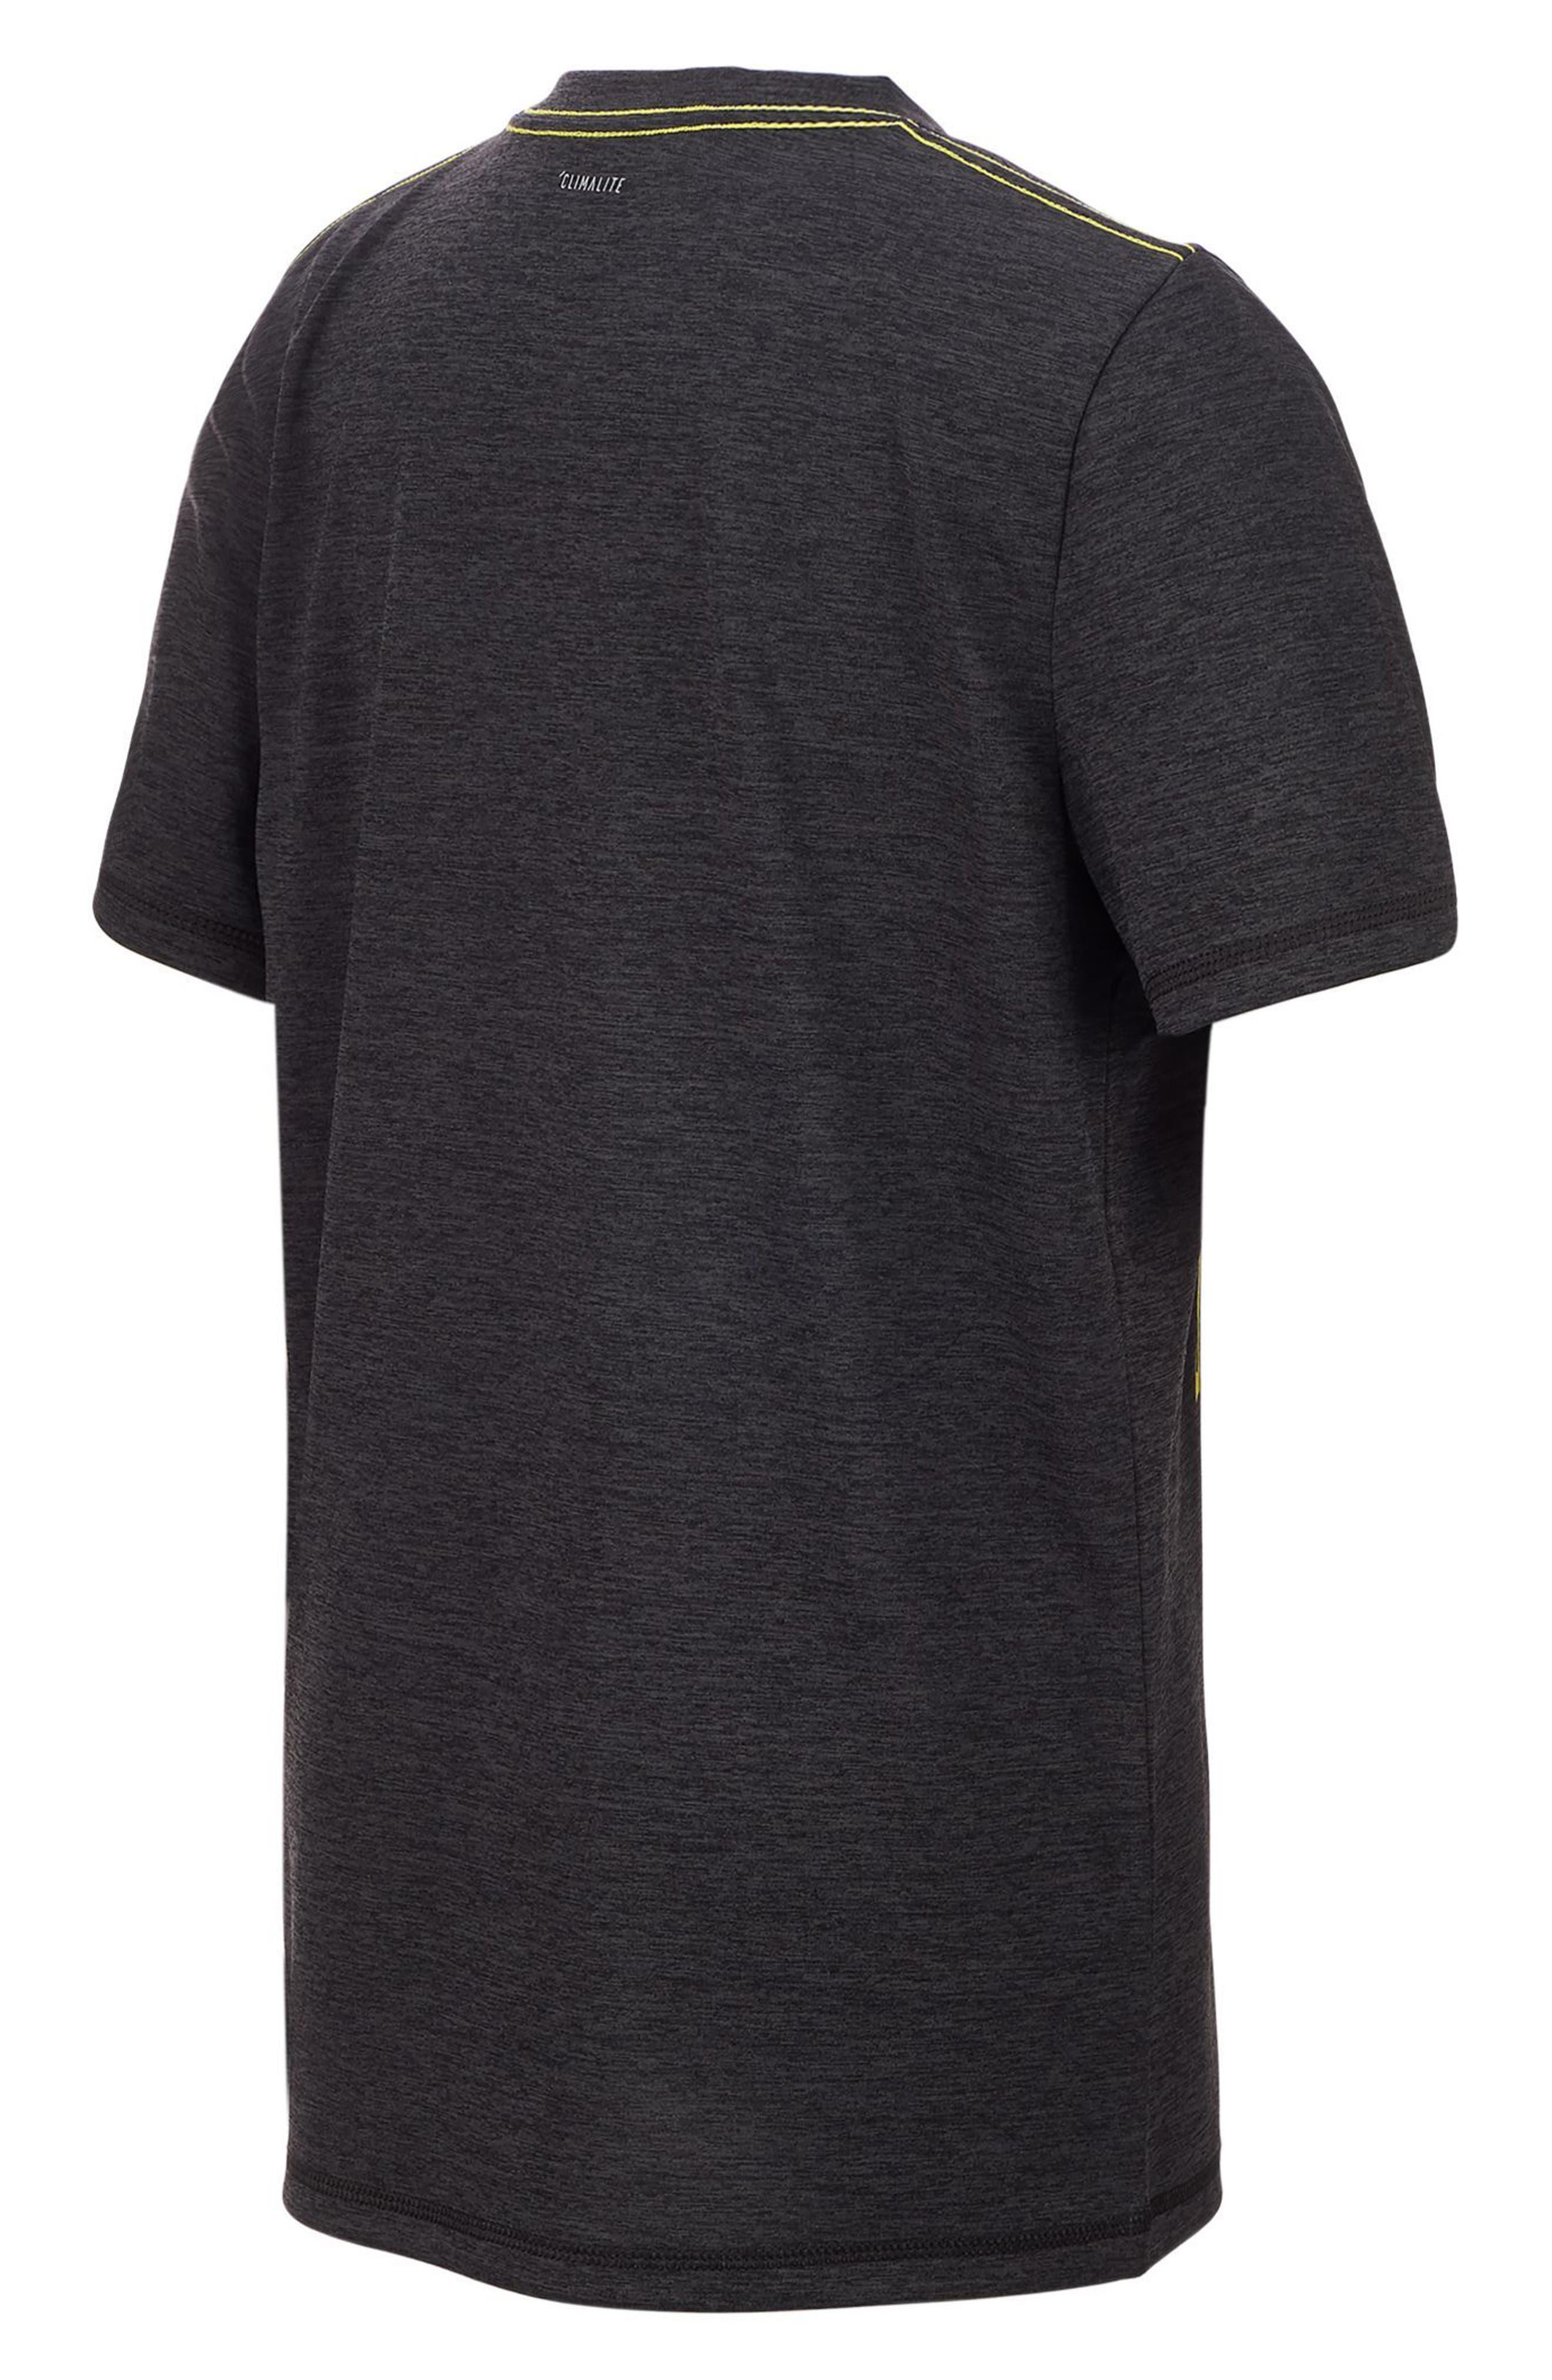 Rocket Ball T-Shirt,                             Alternate thumbnail 2, color,                             Black